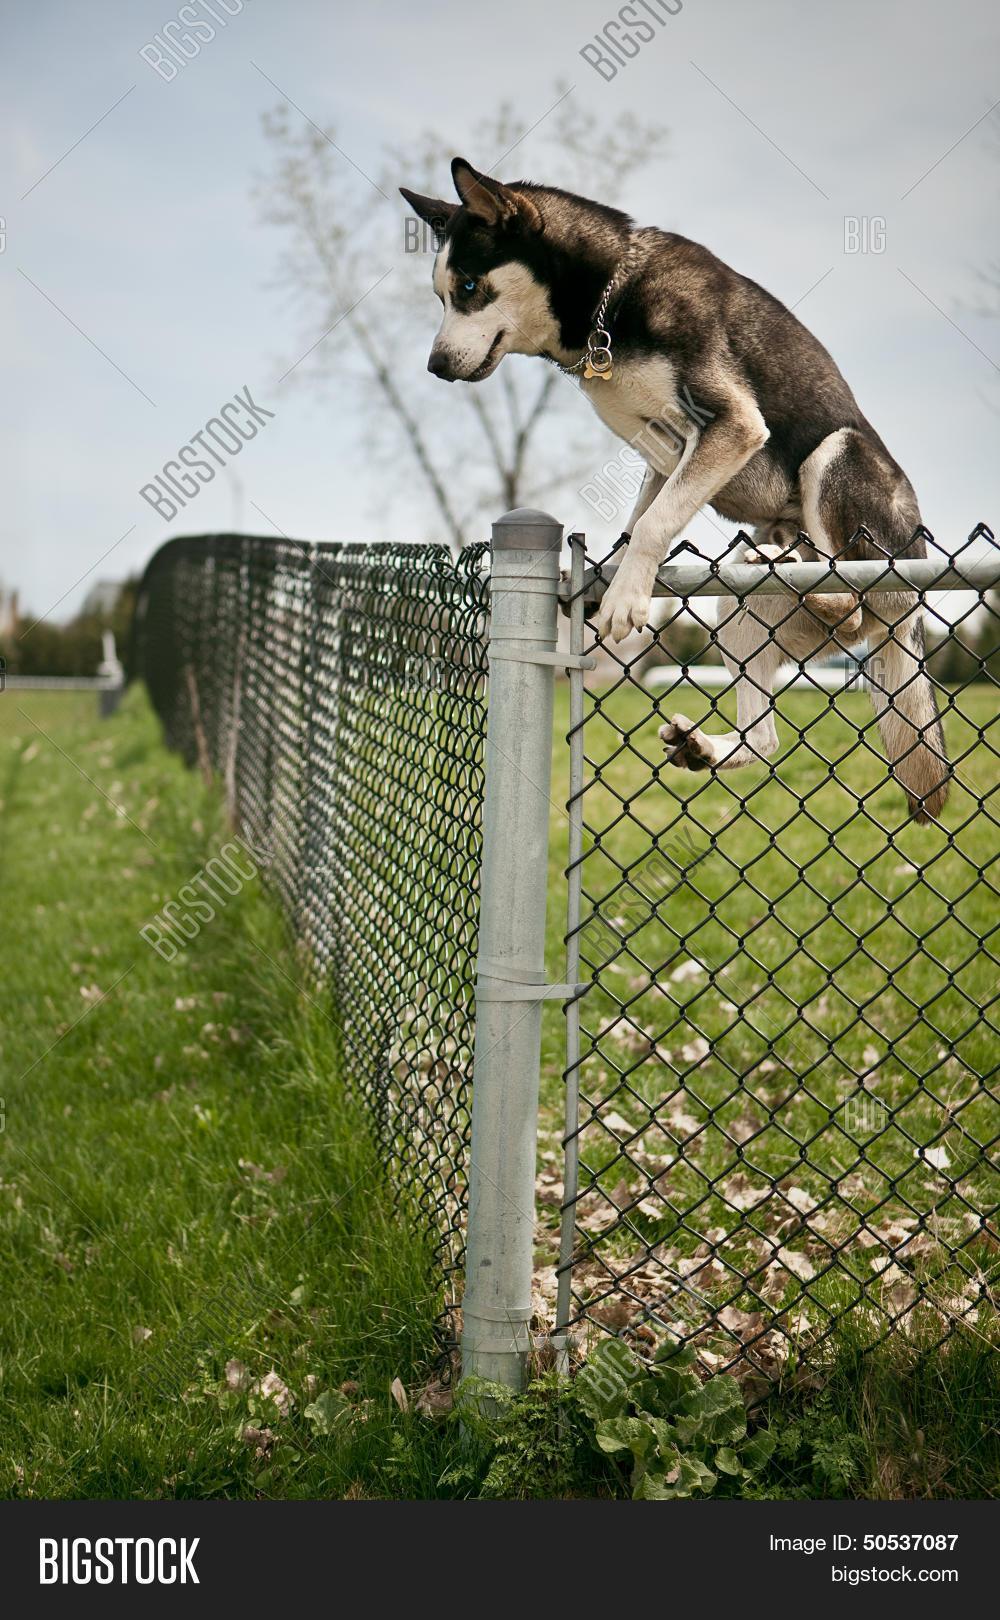 dog jumping over outdoor dog park image u0026 photo bigstock